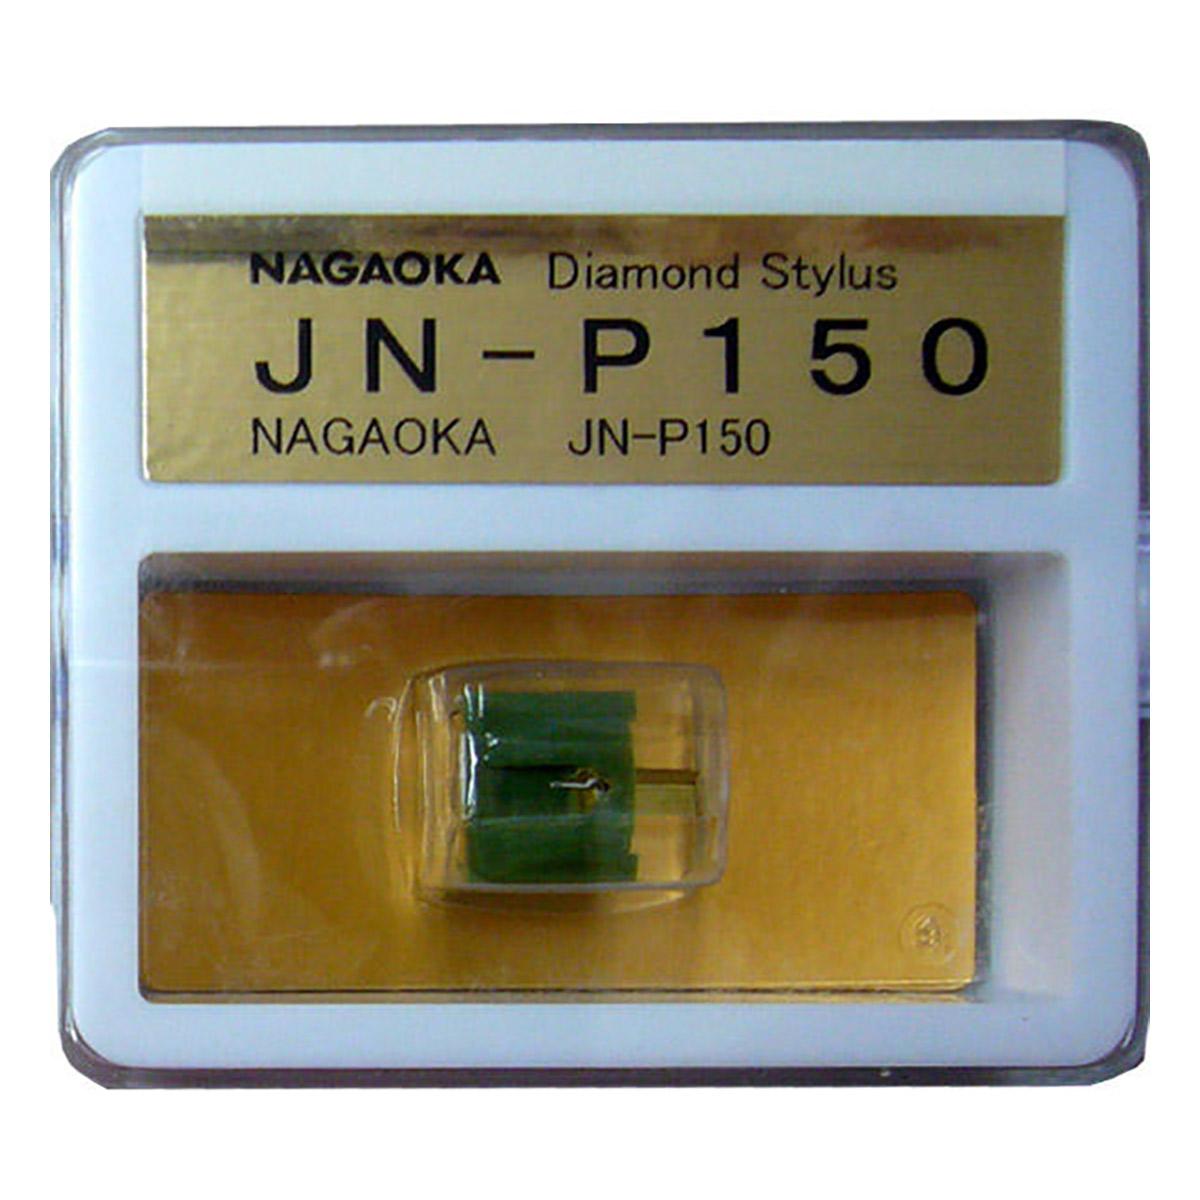 NAGAOKA JN-P150 レコード針 交換針 【ナガオカ】